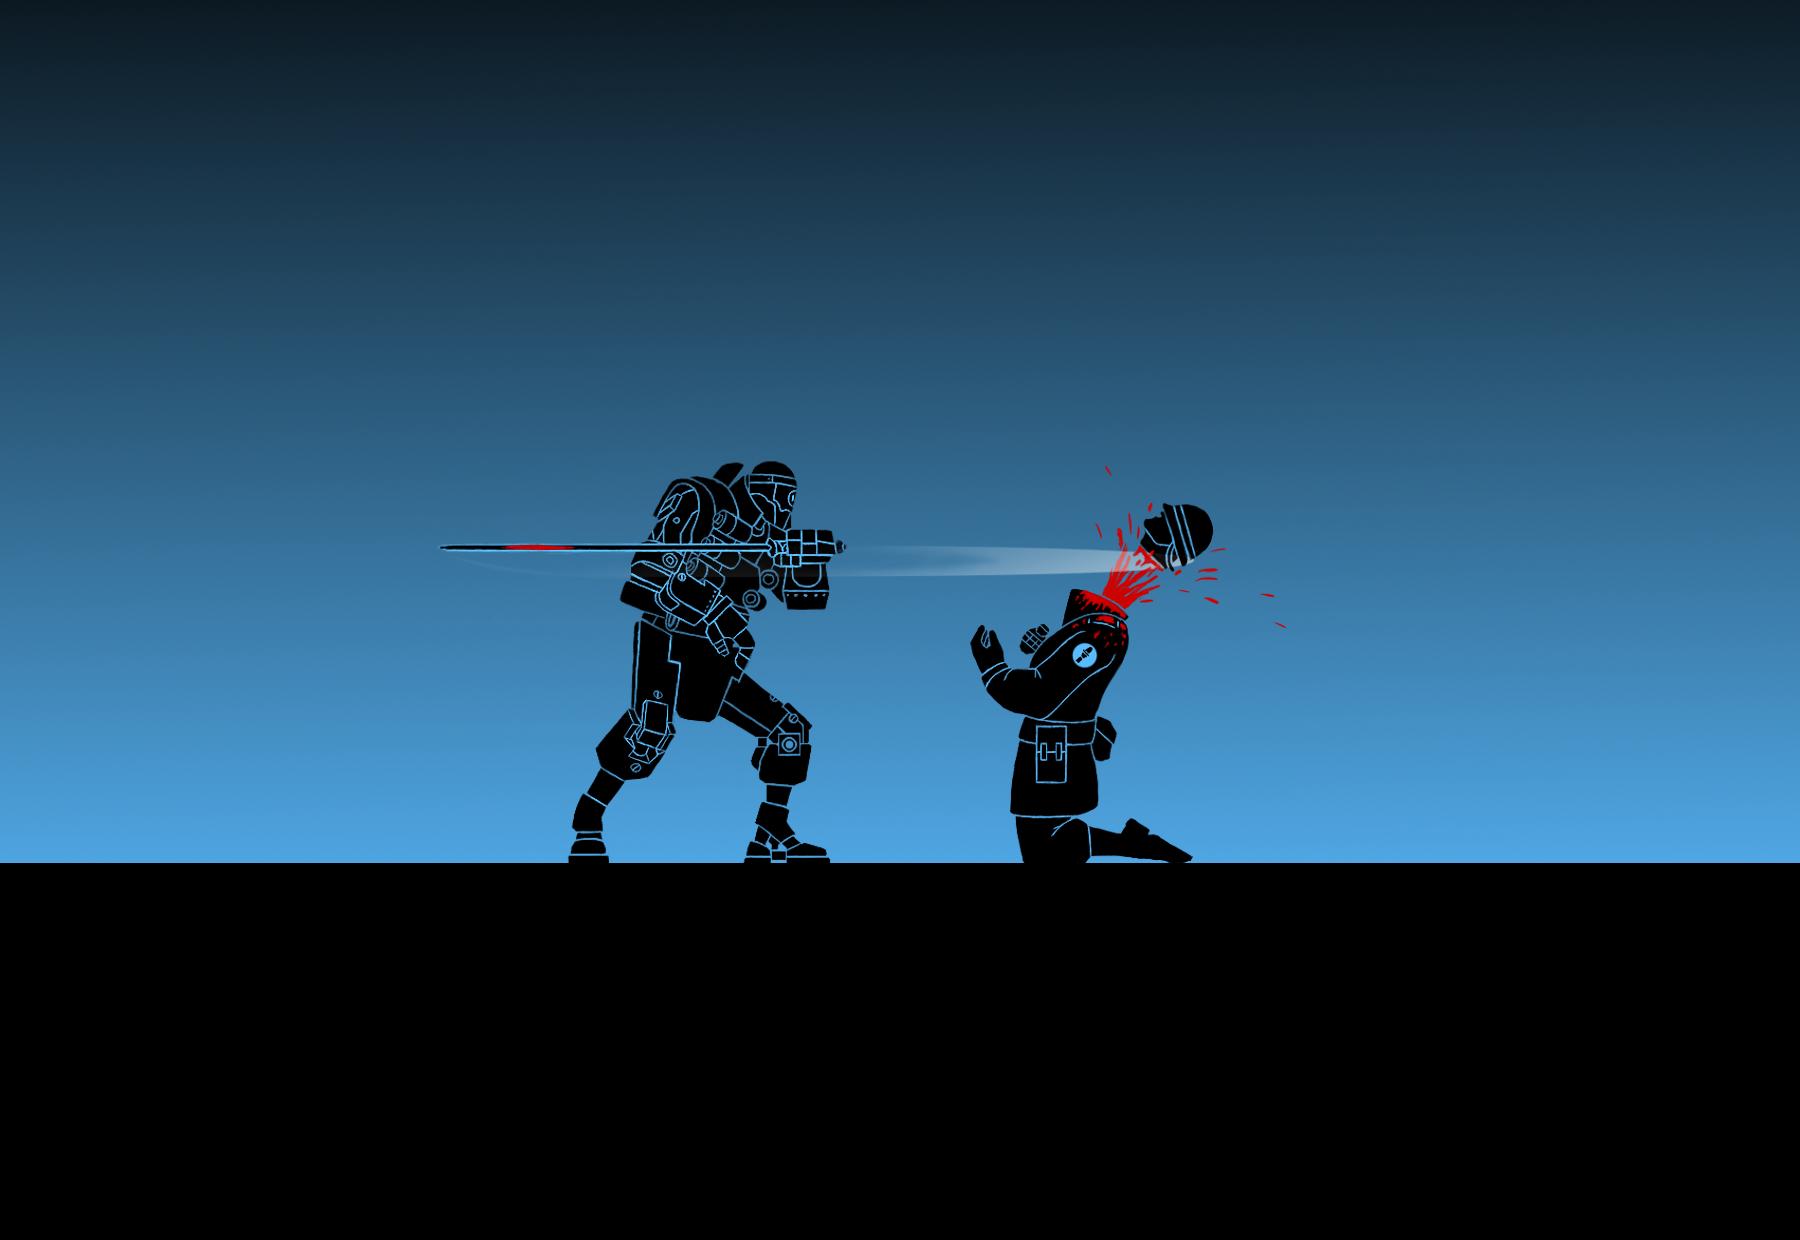 TF2: Demo-bot x Soldier ( Wallpaper ) by Bielek on DeviantArt  TF2: Demo-bot x...